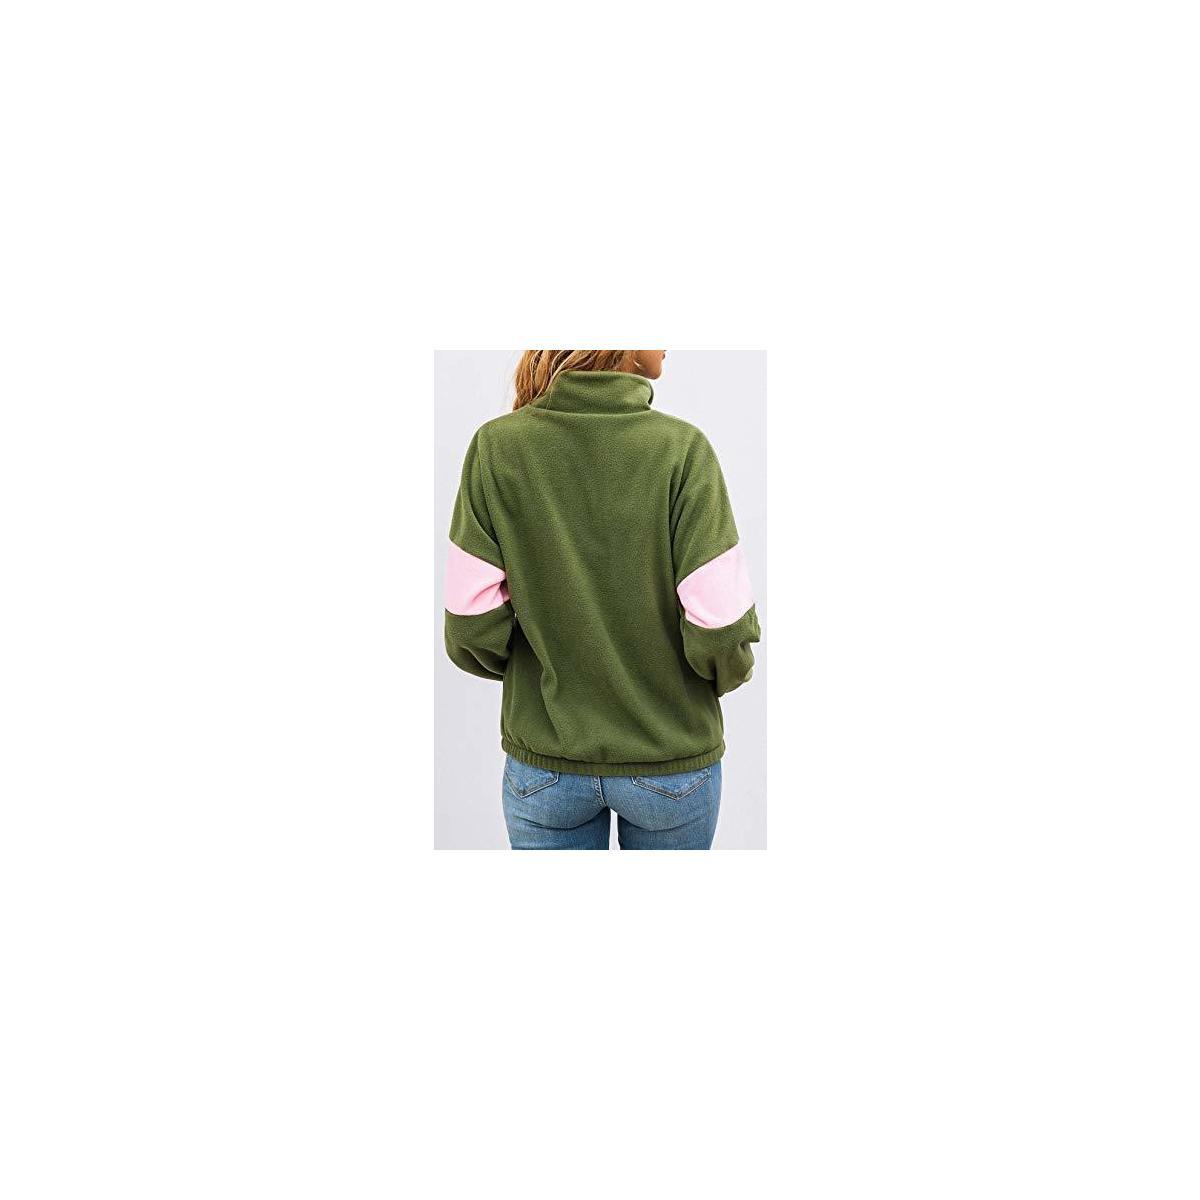 Women's Long Sleeve Half Zipper Pullover Sweatshirt Crossing Windproof Fleece Anti-Pilling Coat Winter Outwear Tops